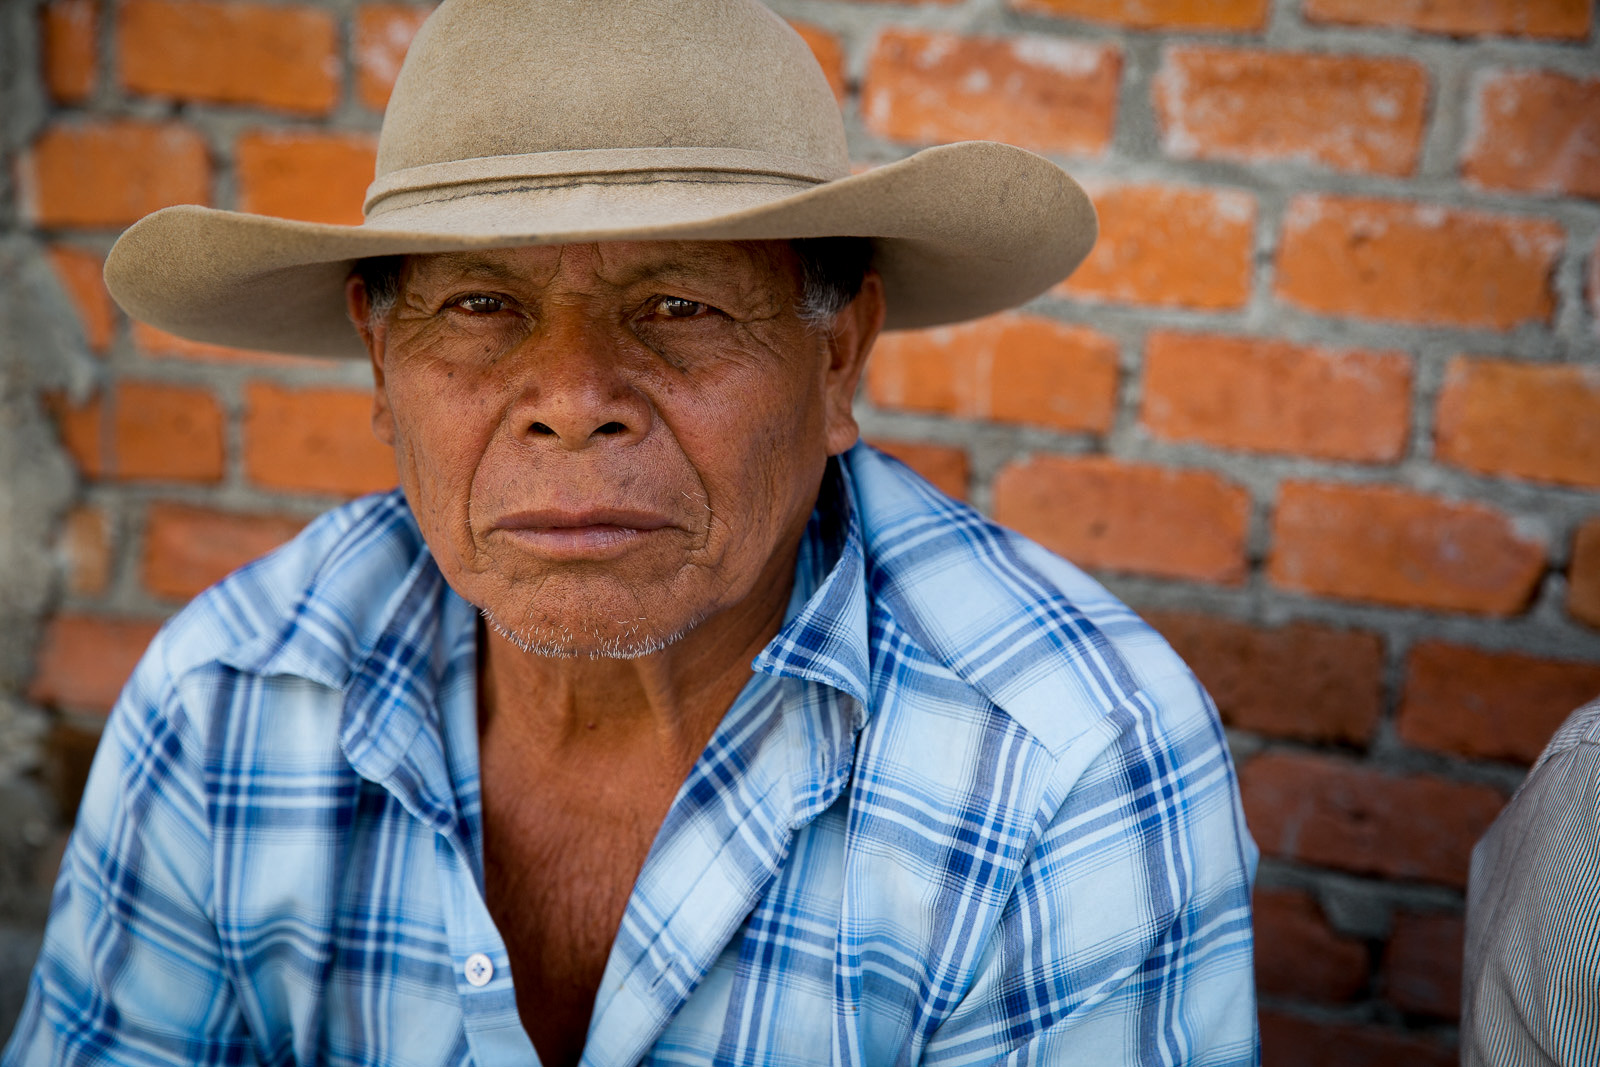 Maestro Mezcalero, Don Cosme Hernandez, San Baltazar, Oaxaca, Mexico